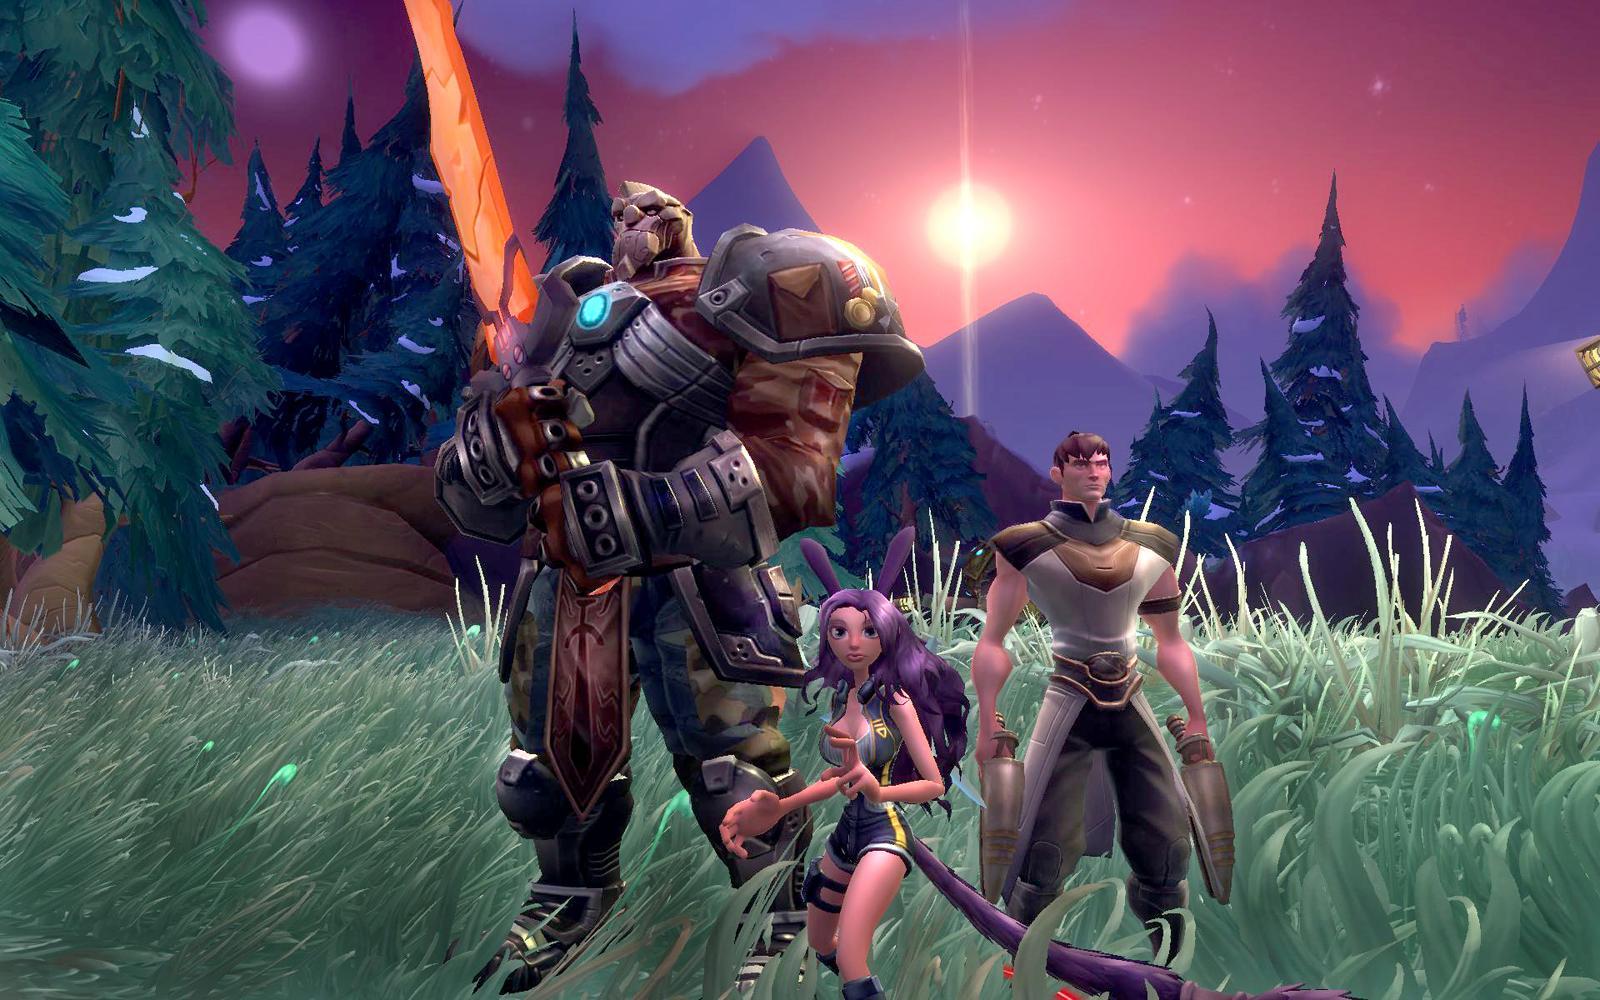 gry multiplayer gatunki